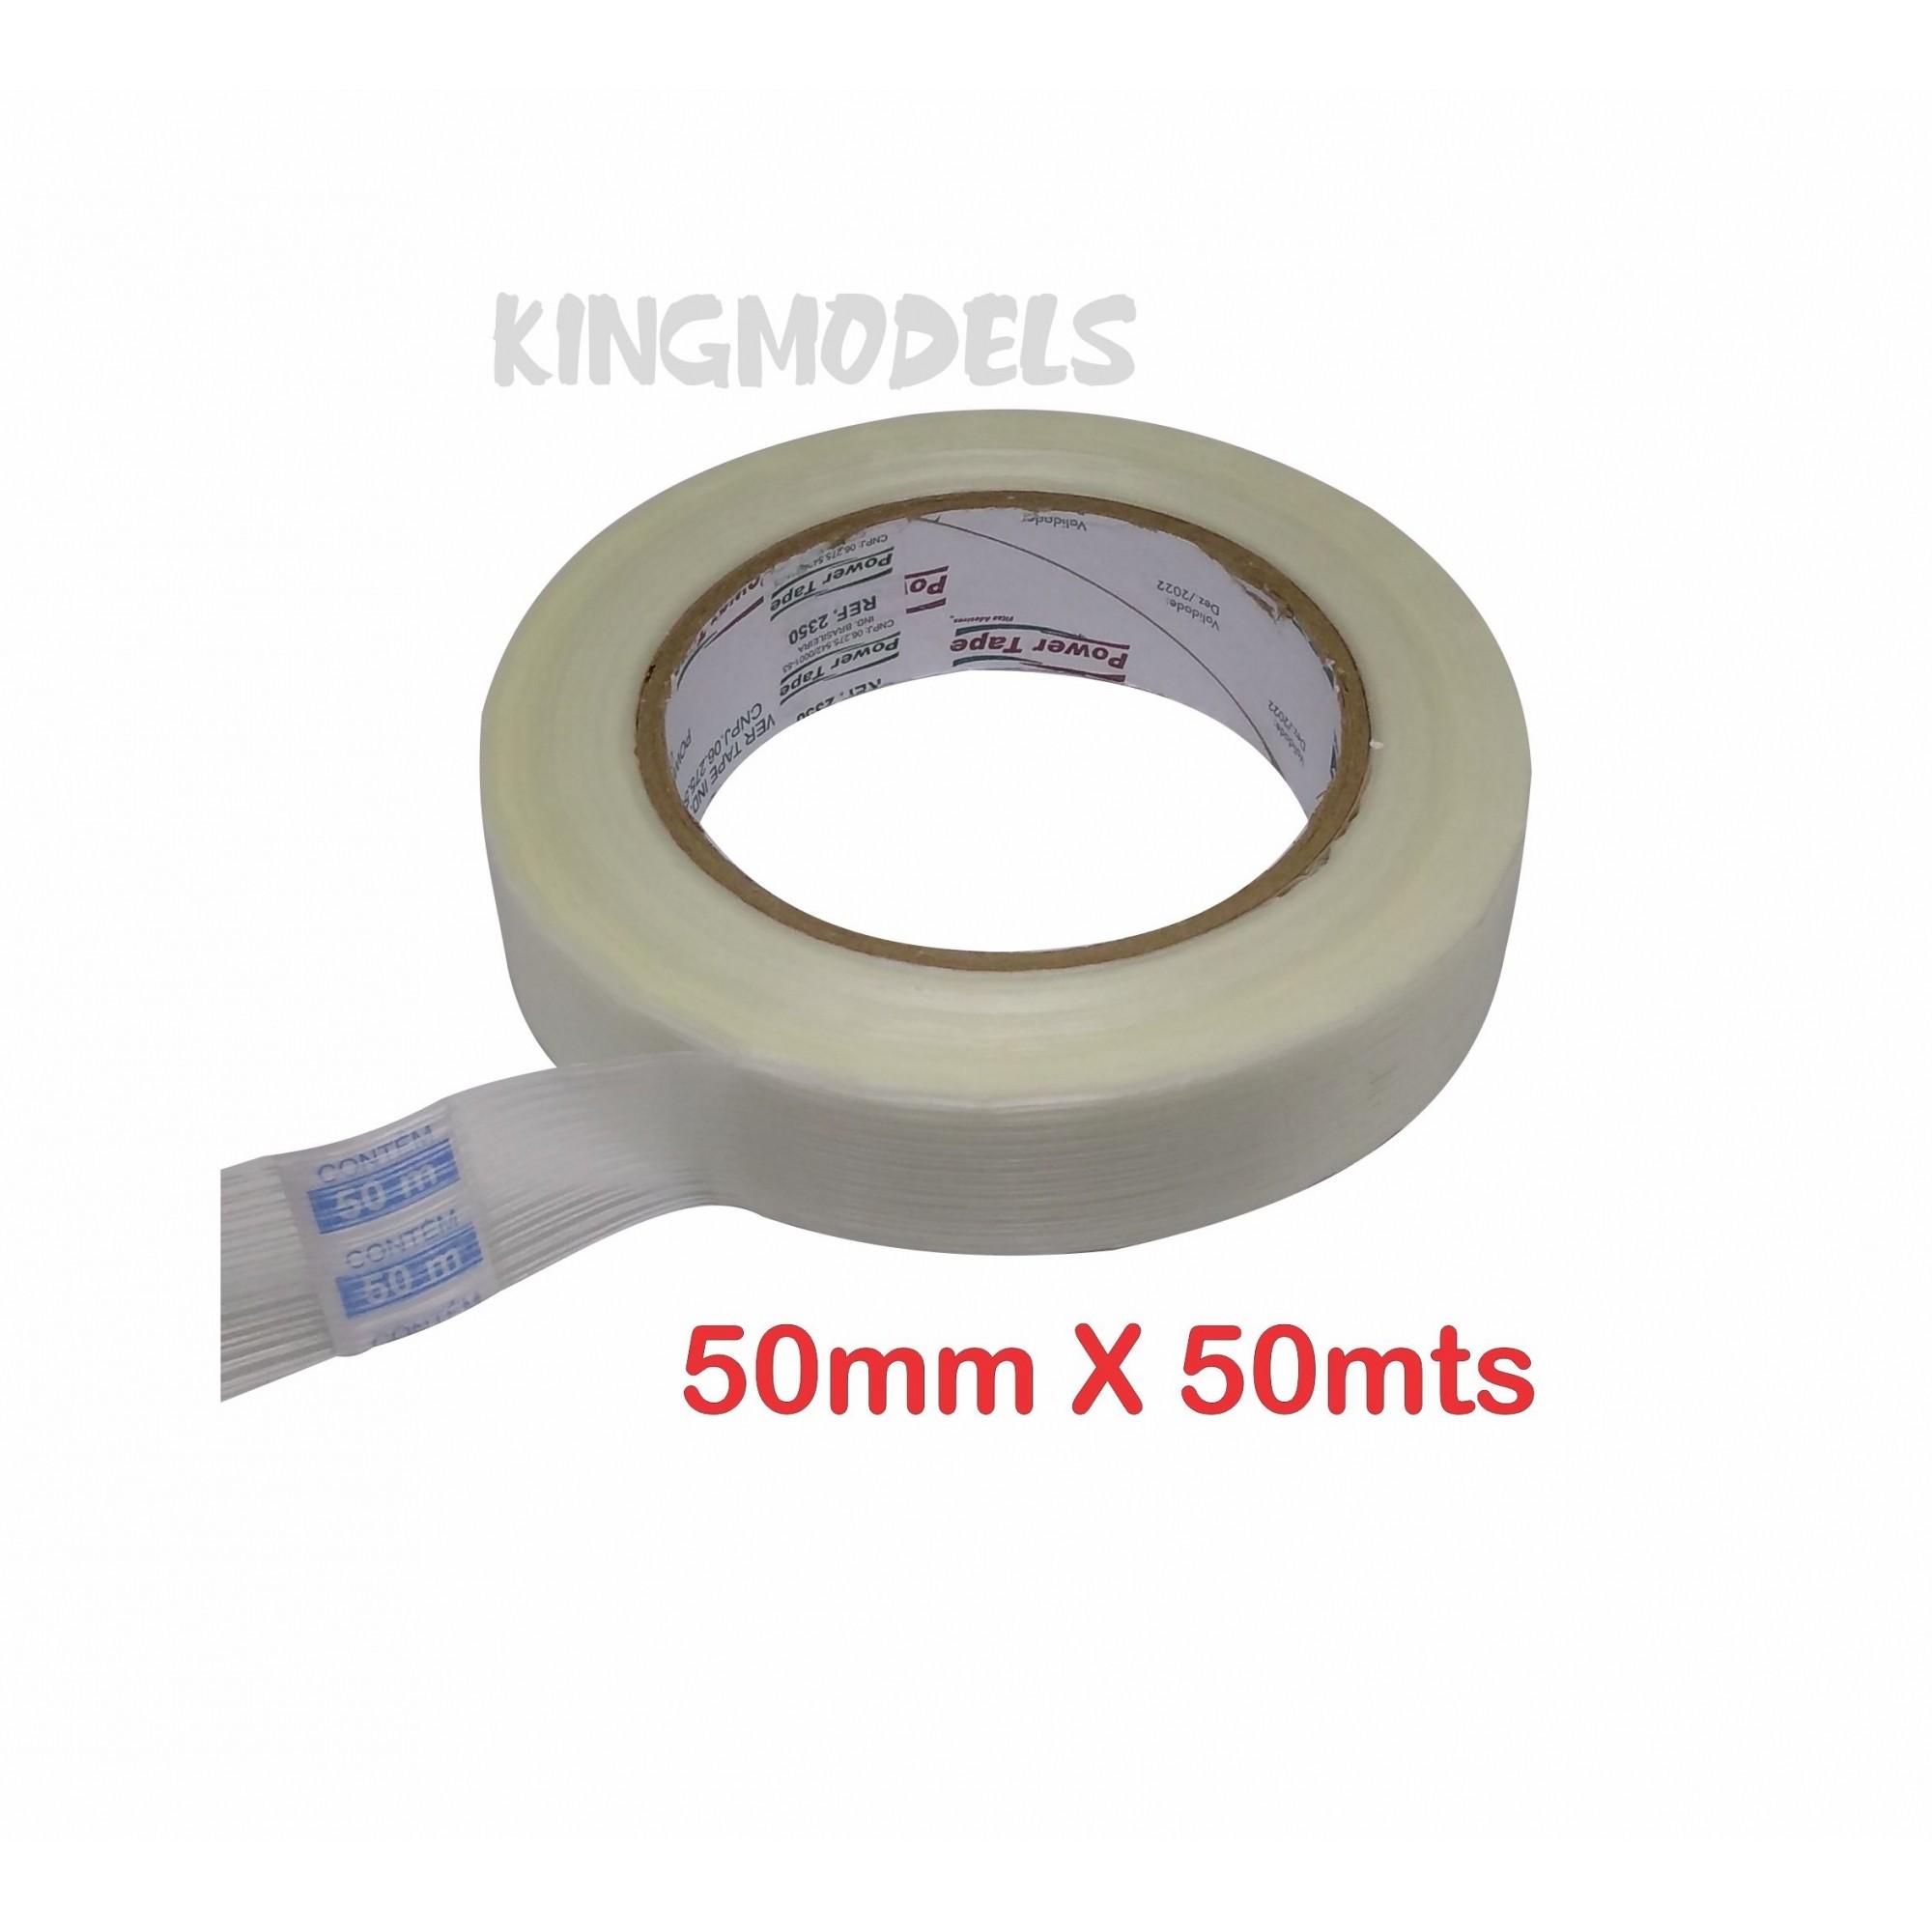 Fita Filamentosa Em Pp - 50mm X 50mts - Reforço Aeromodelo  - King Models